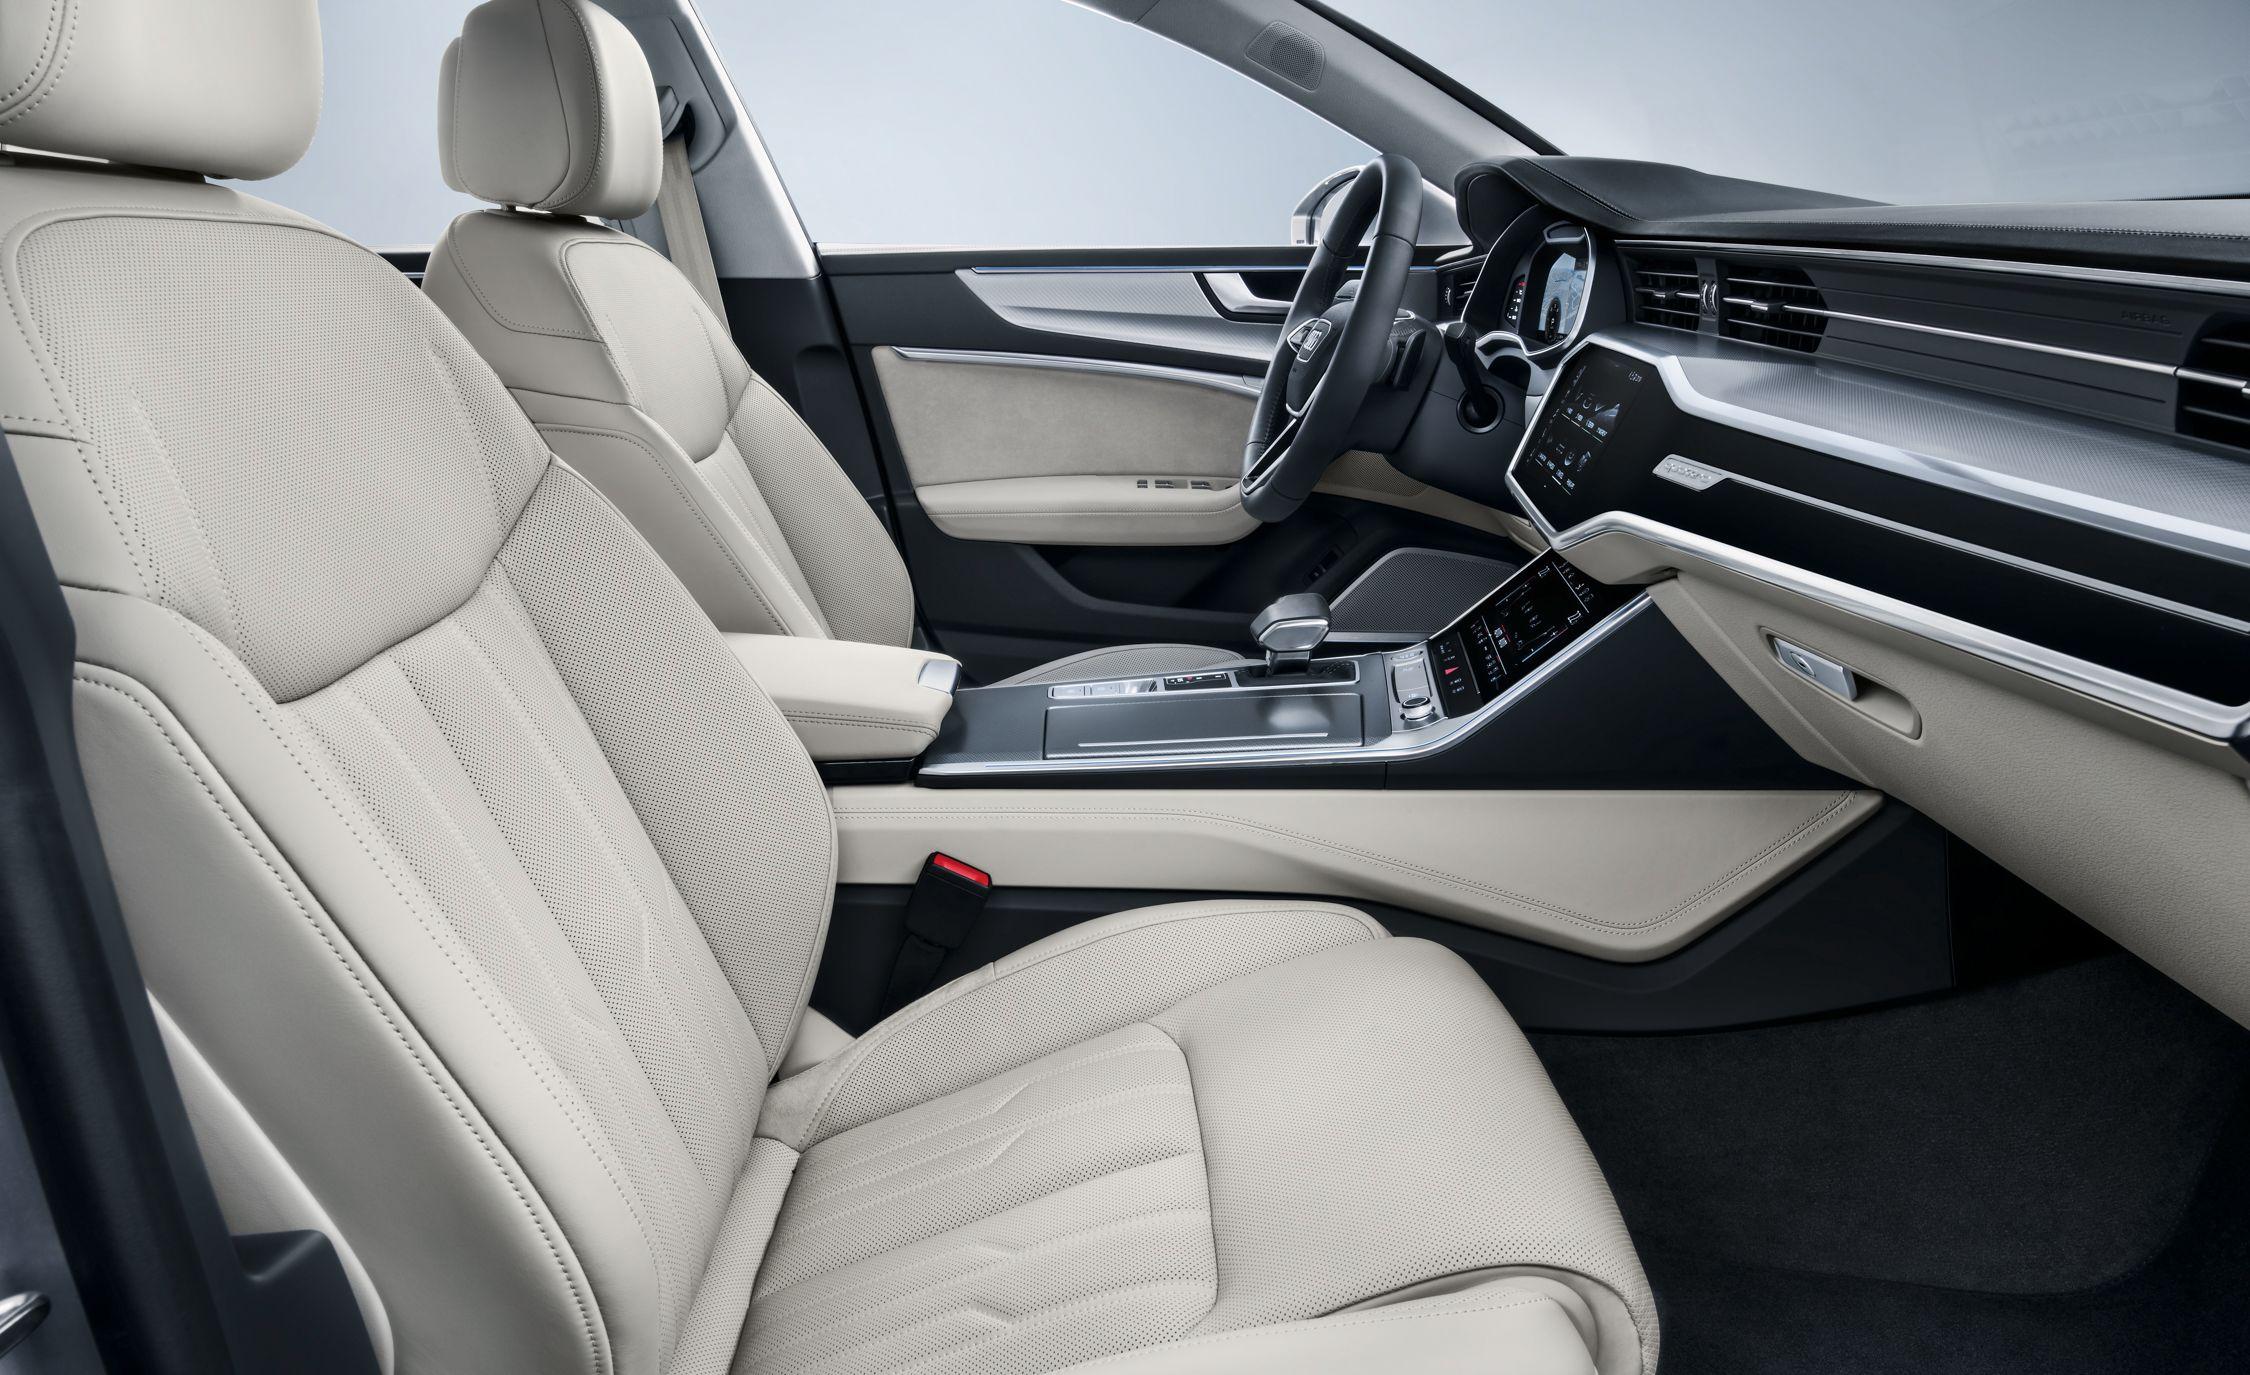 2019-Audi-A7-Sportback-158-1.jpg